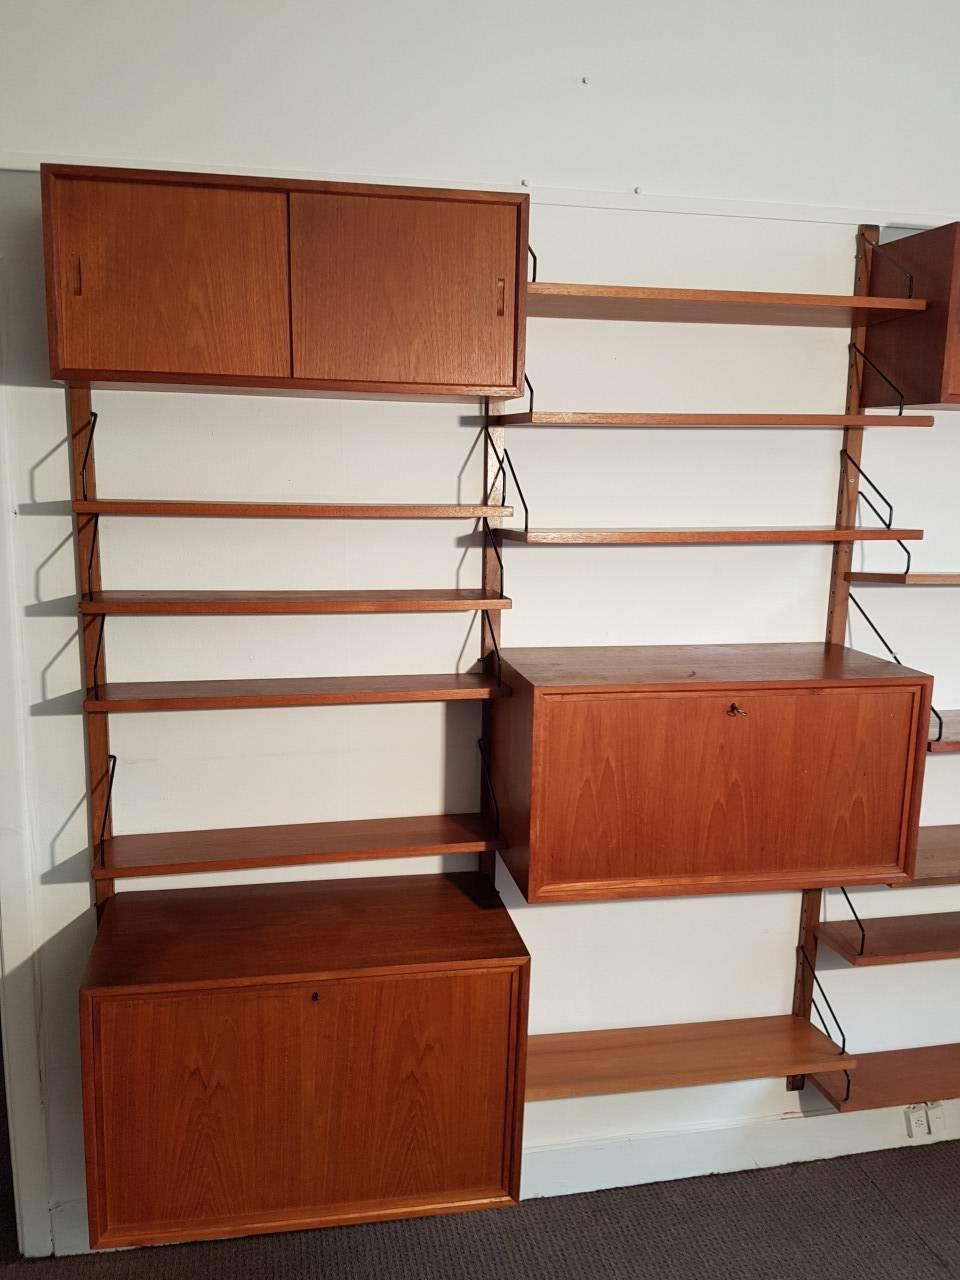 biblioth que design scandinave de paul cadovius benoit de moffarts vide grenier belgique. Black Bedroom Furniture Sets. Home Design Ideas